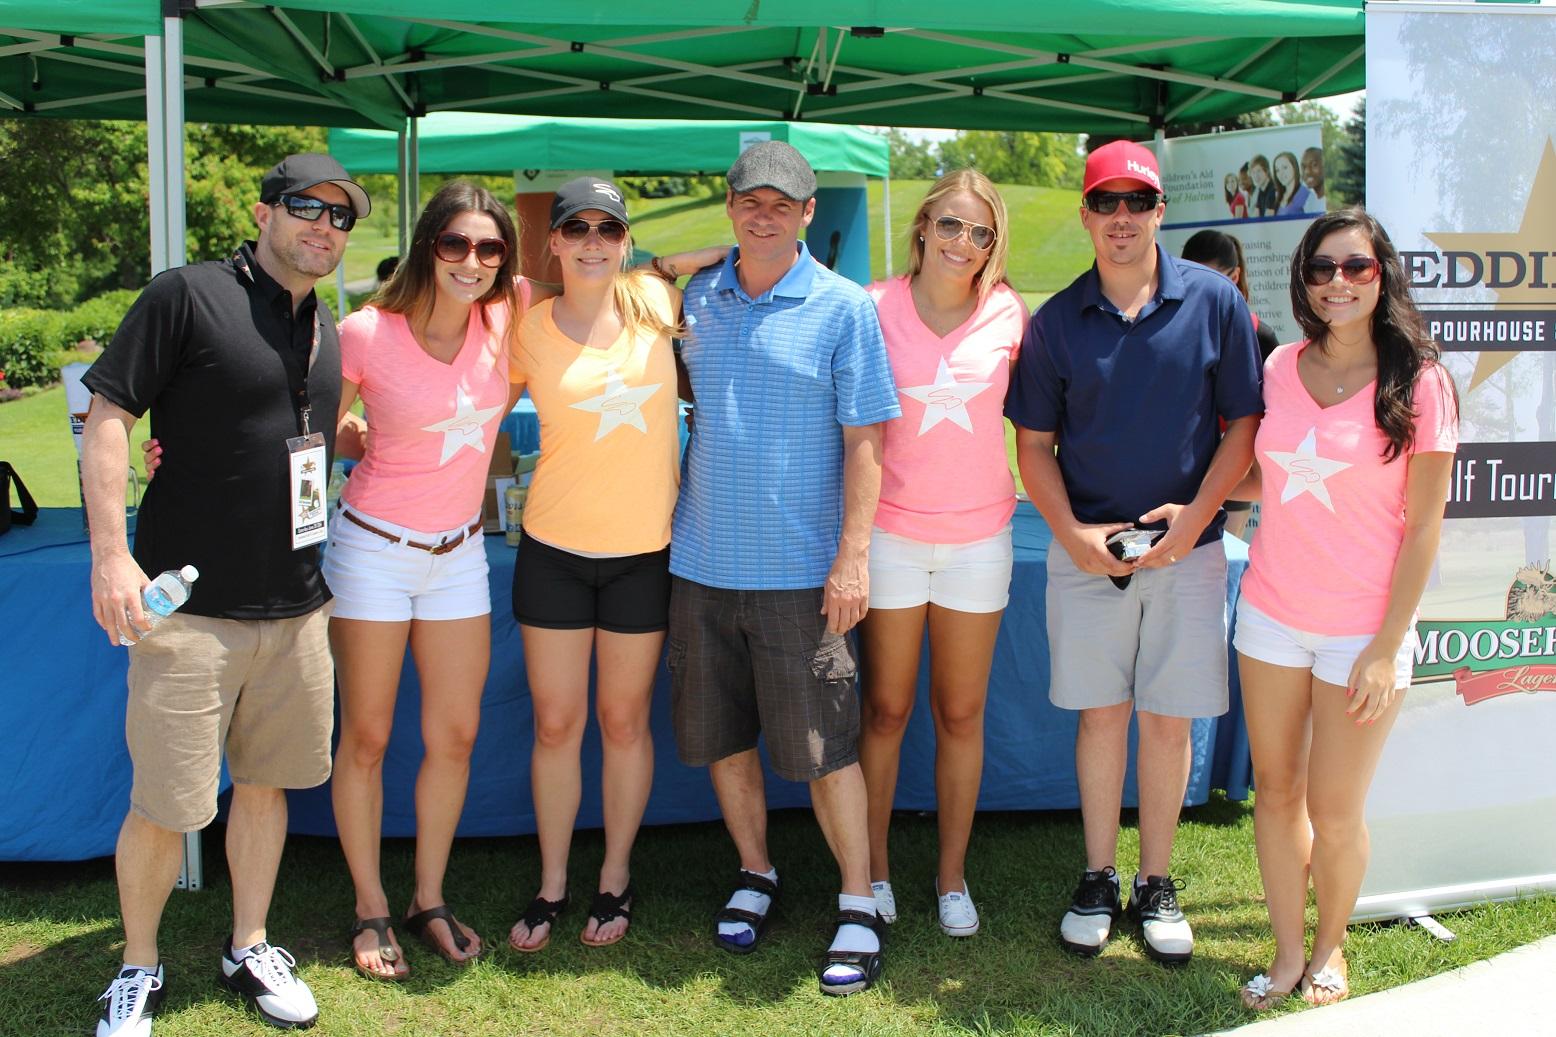 EddieO's Golf guests 21.jpg